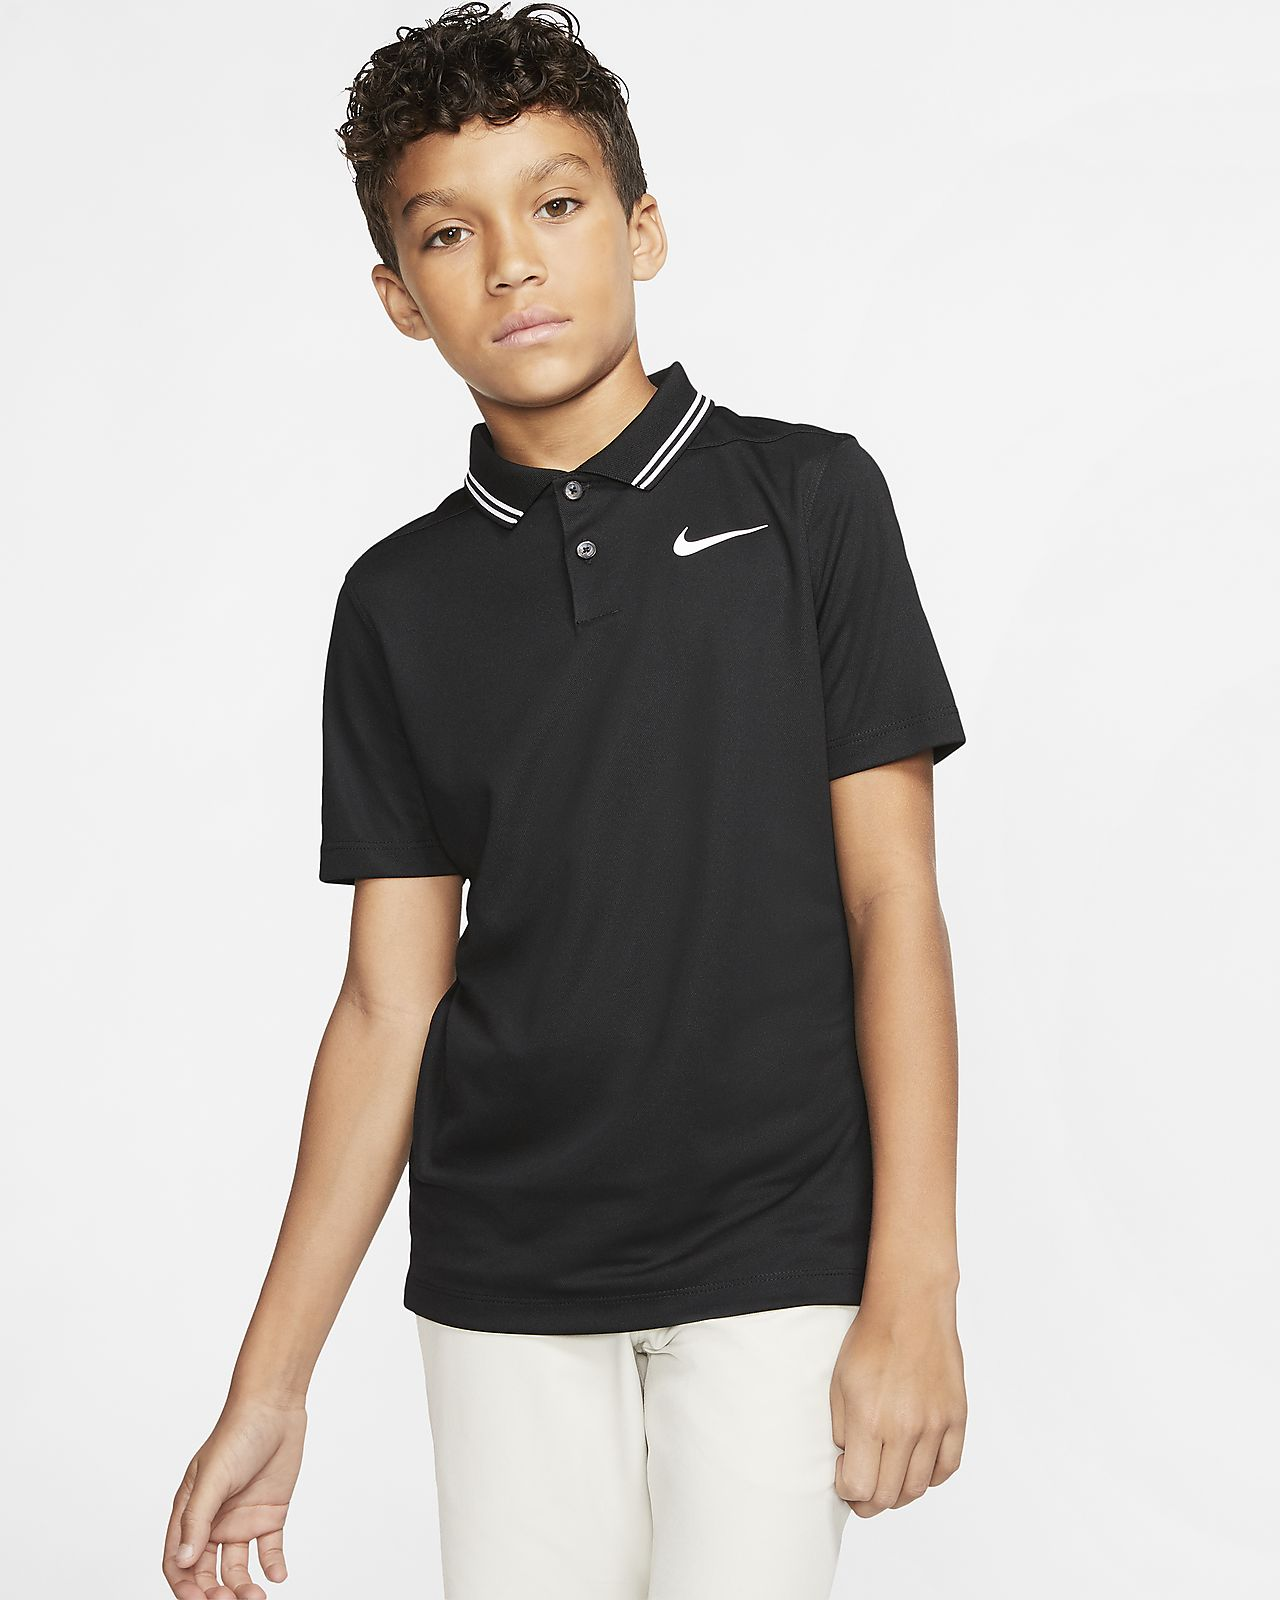 Nike Dri-FIT Victory Polo de golf - Nen